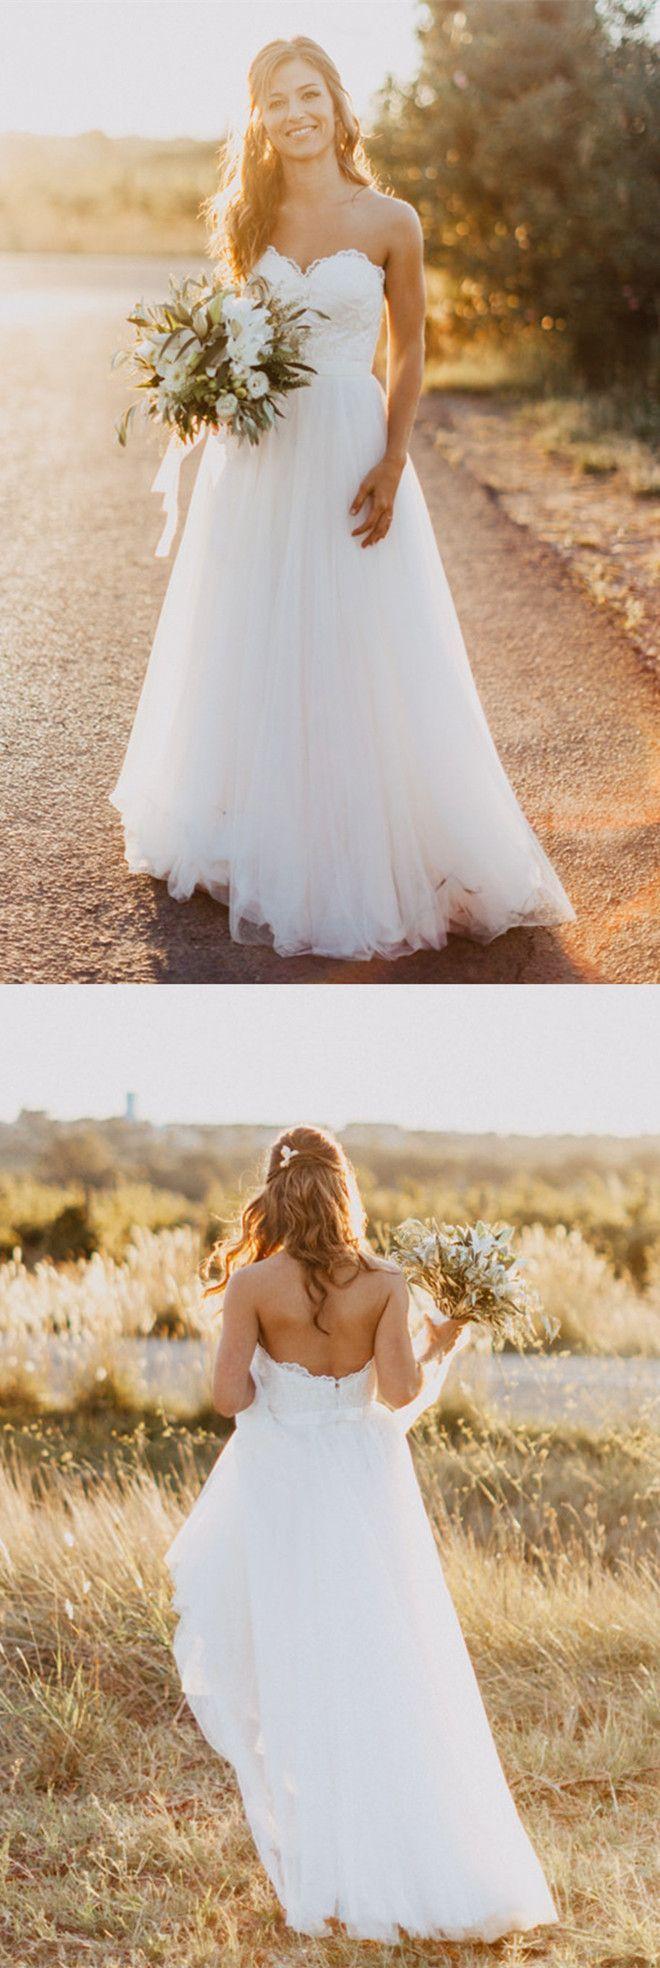 Lace wedding dresses white wedding dressesbeach wedding